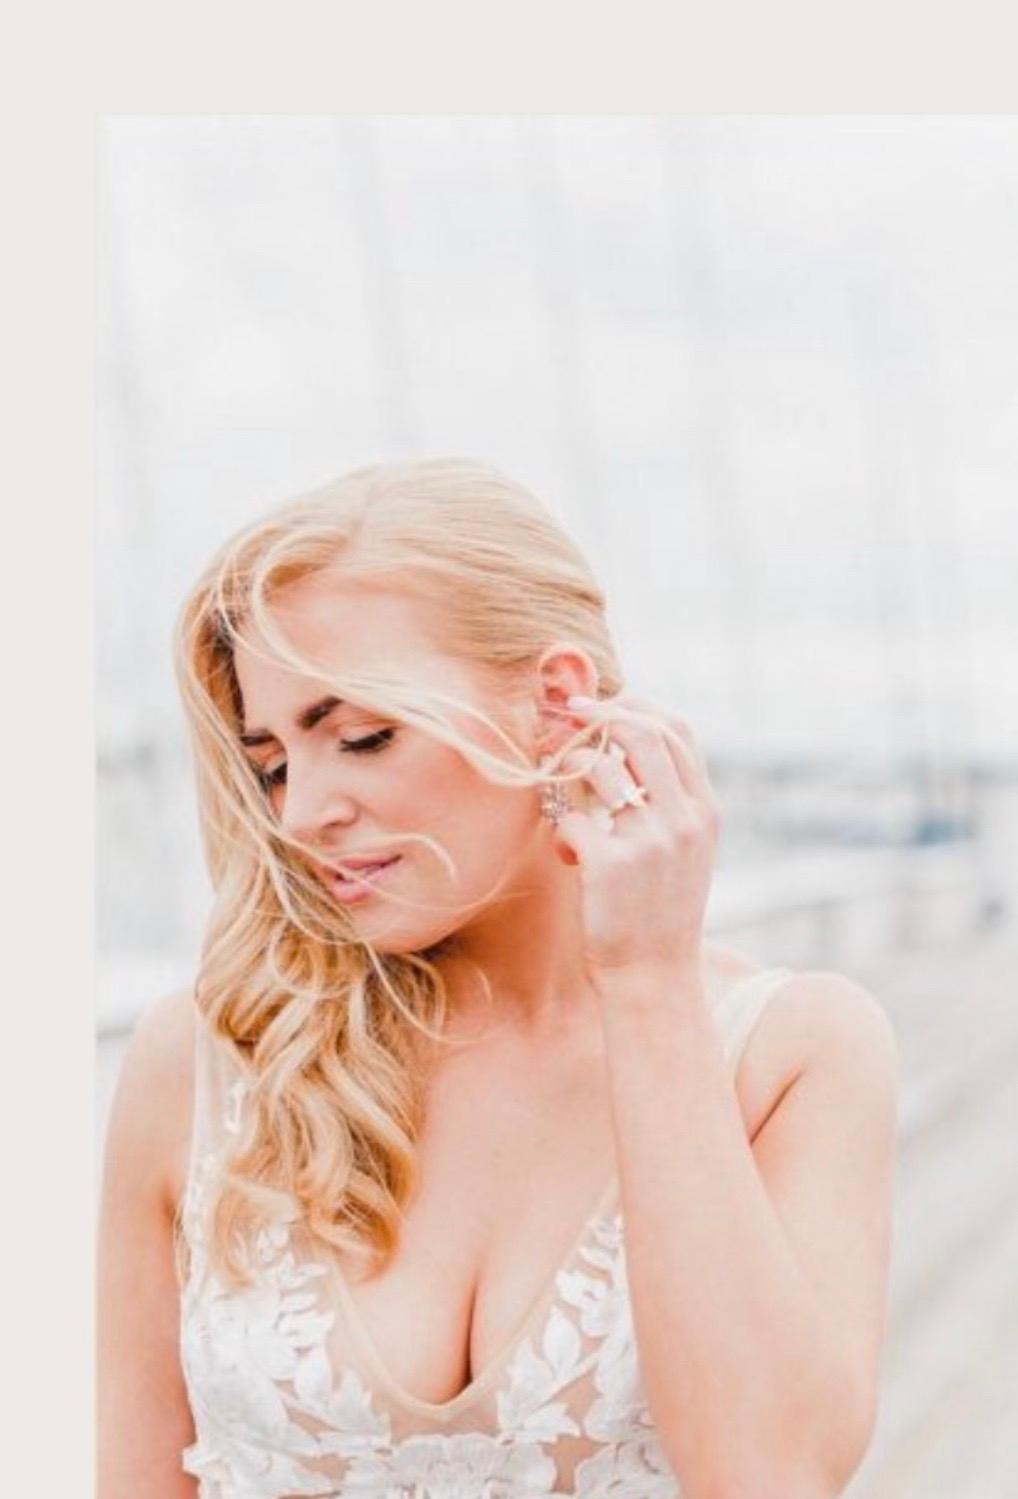 Bridal Trial Make-up